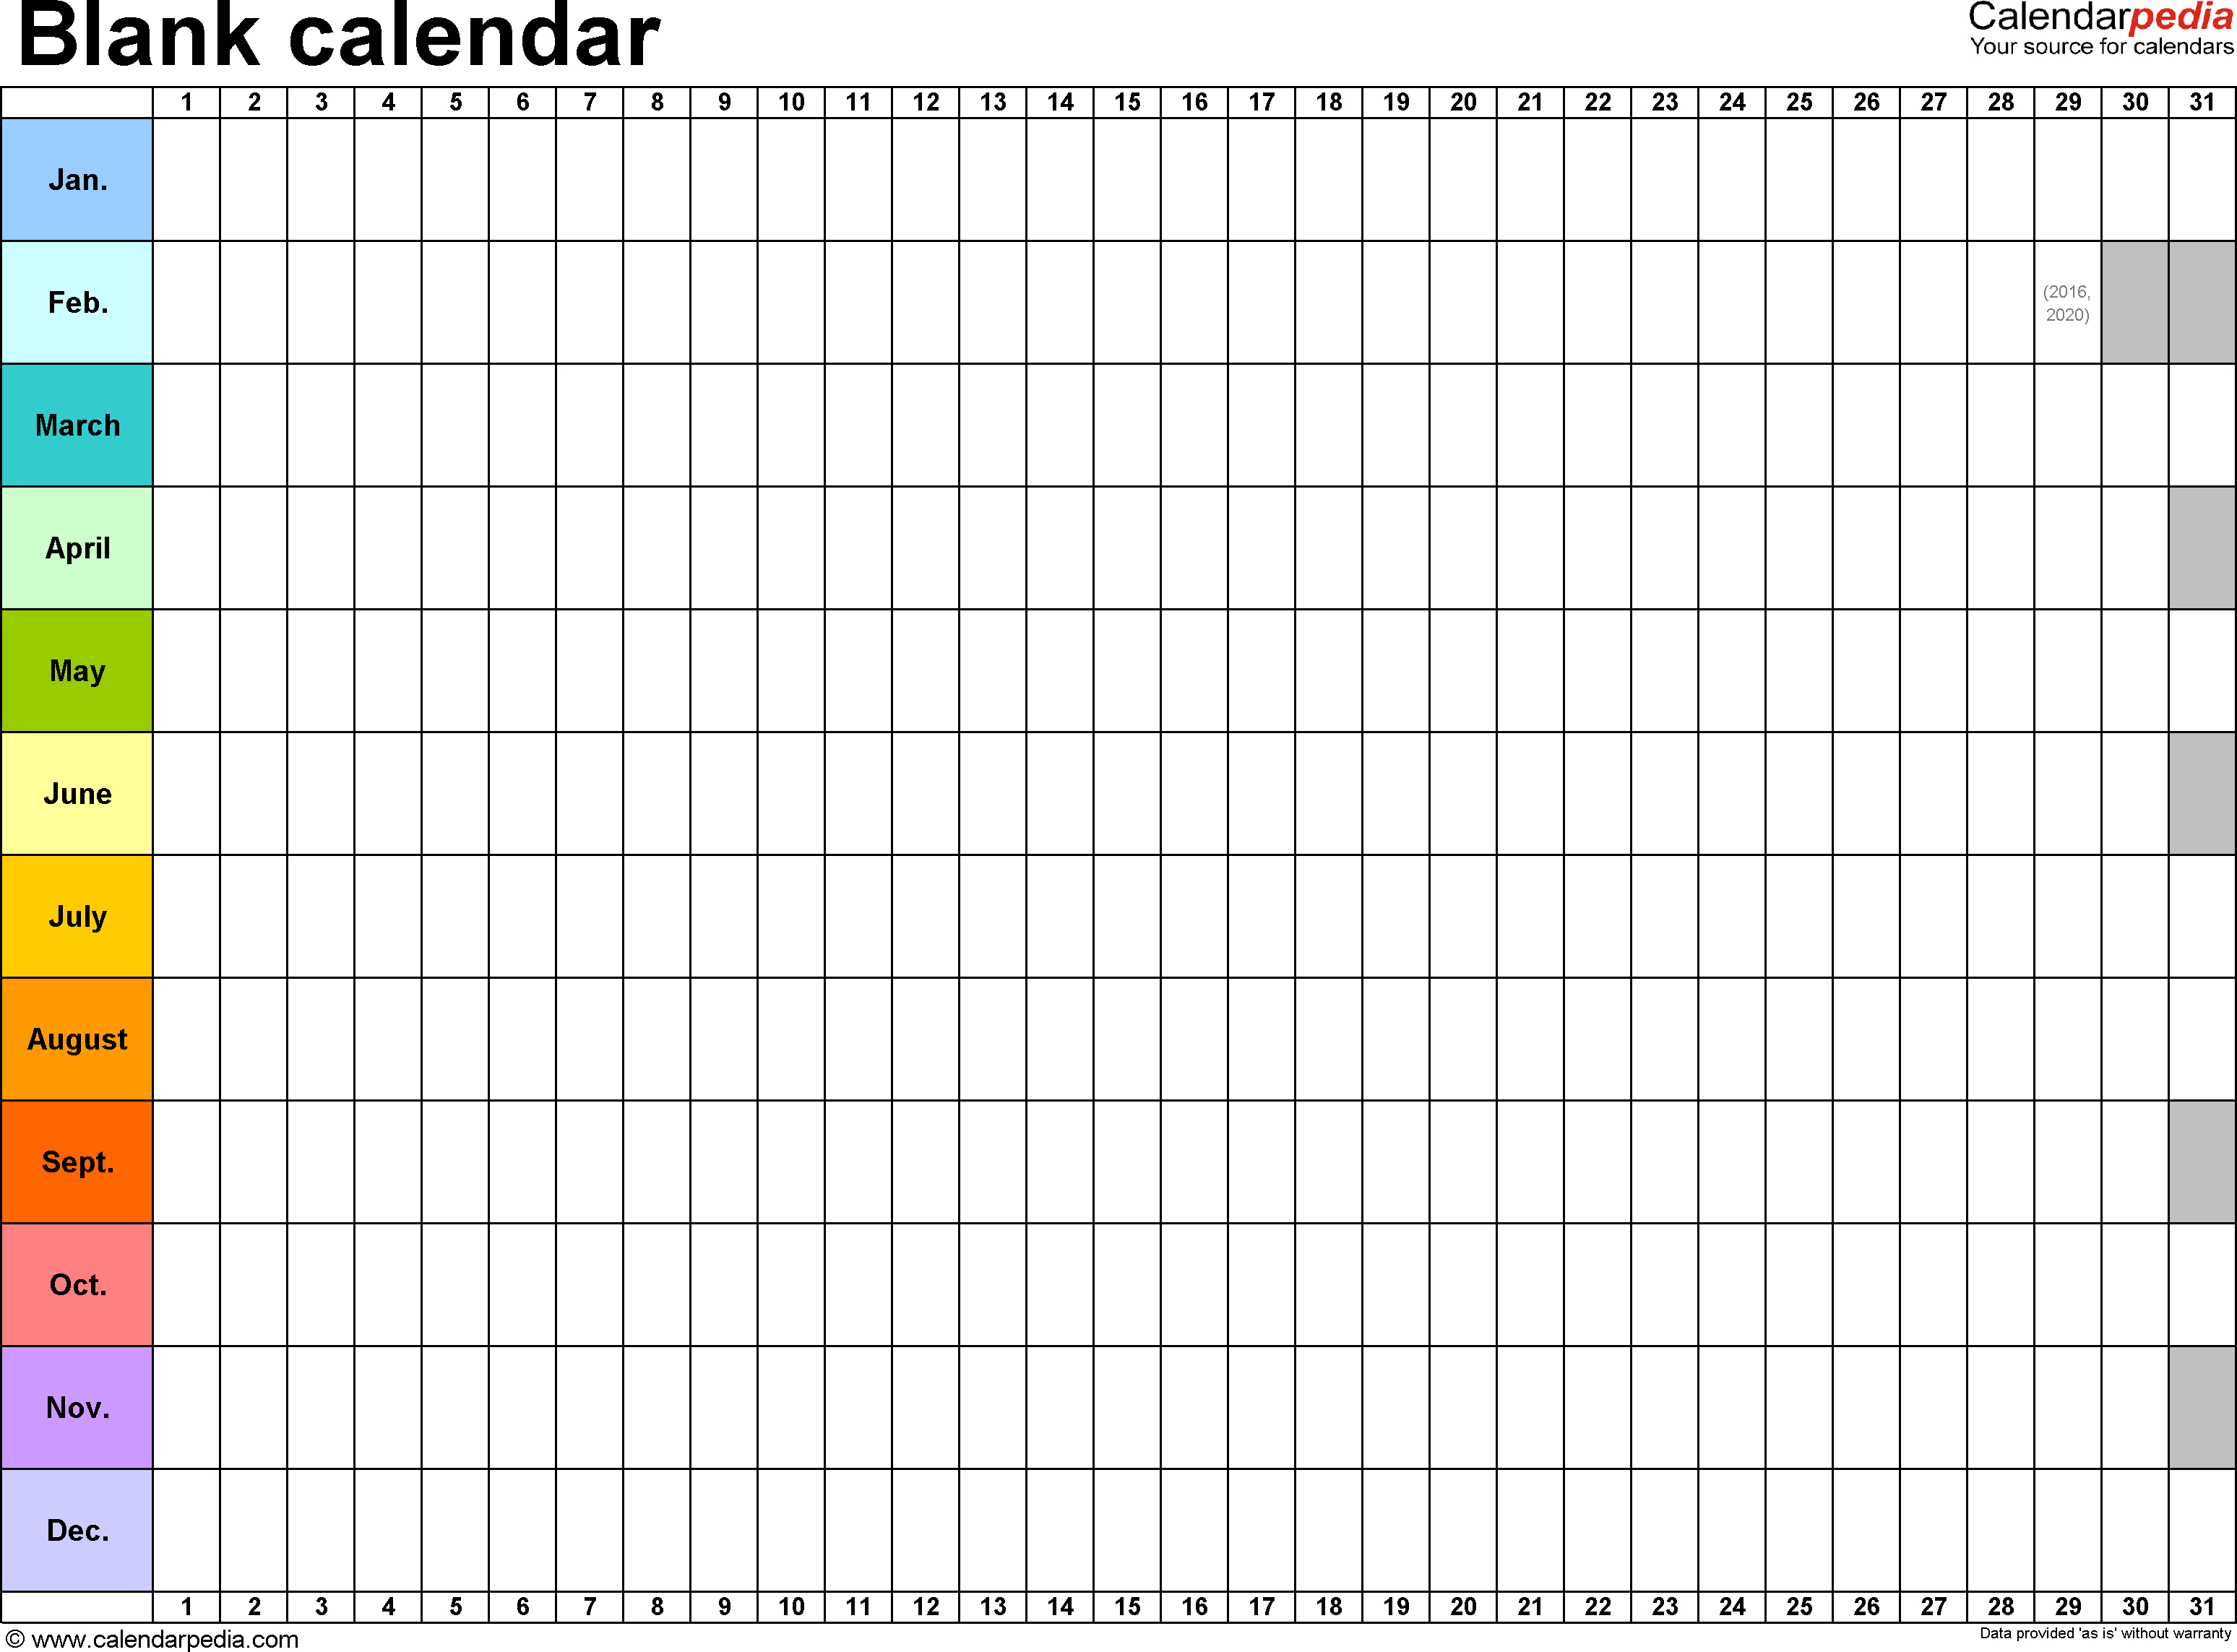 Template 2: Excel Template For Blank Calendar (Landscape